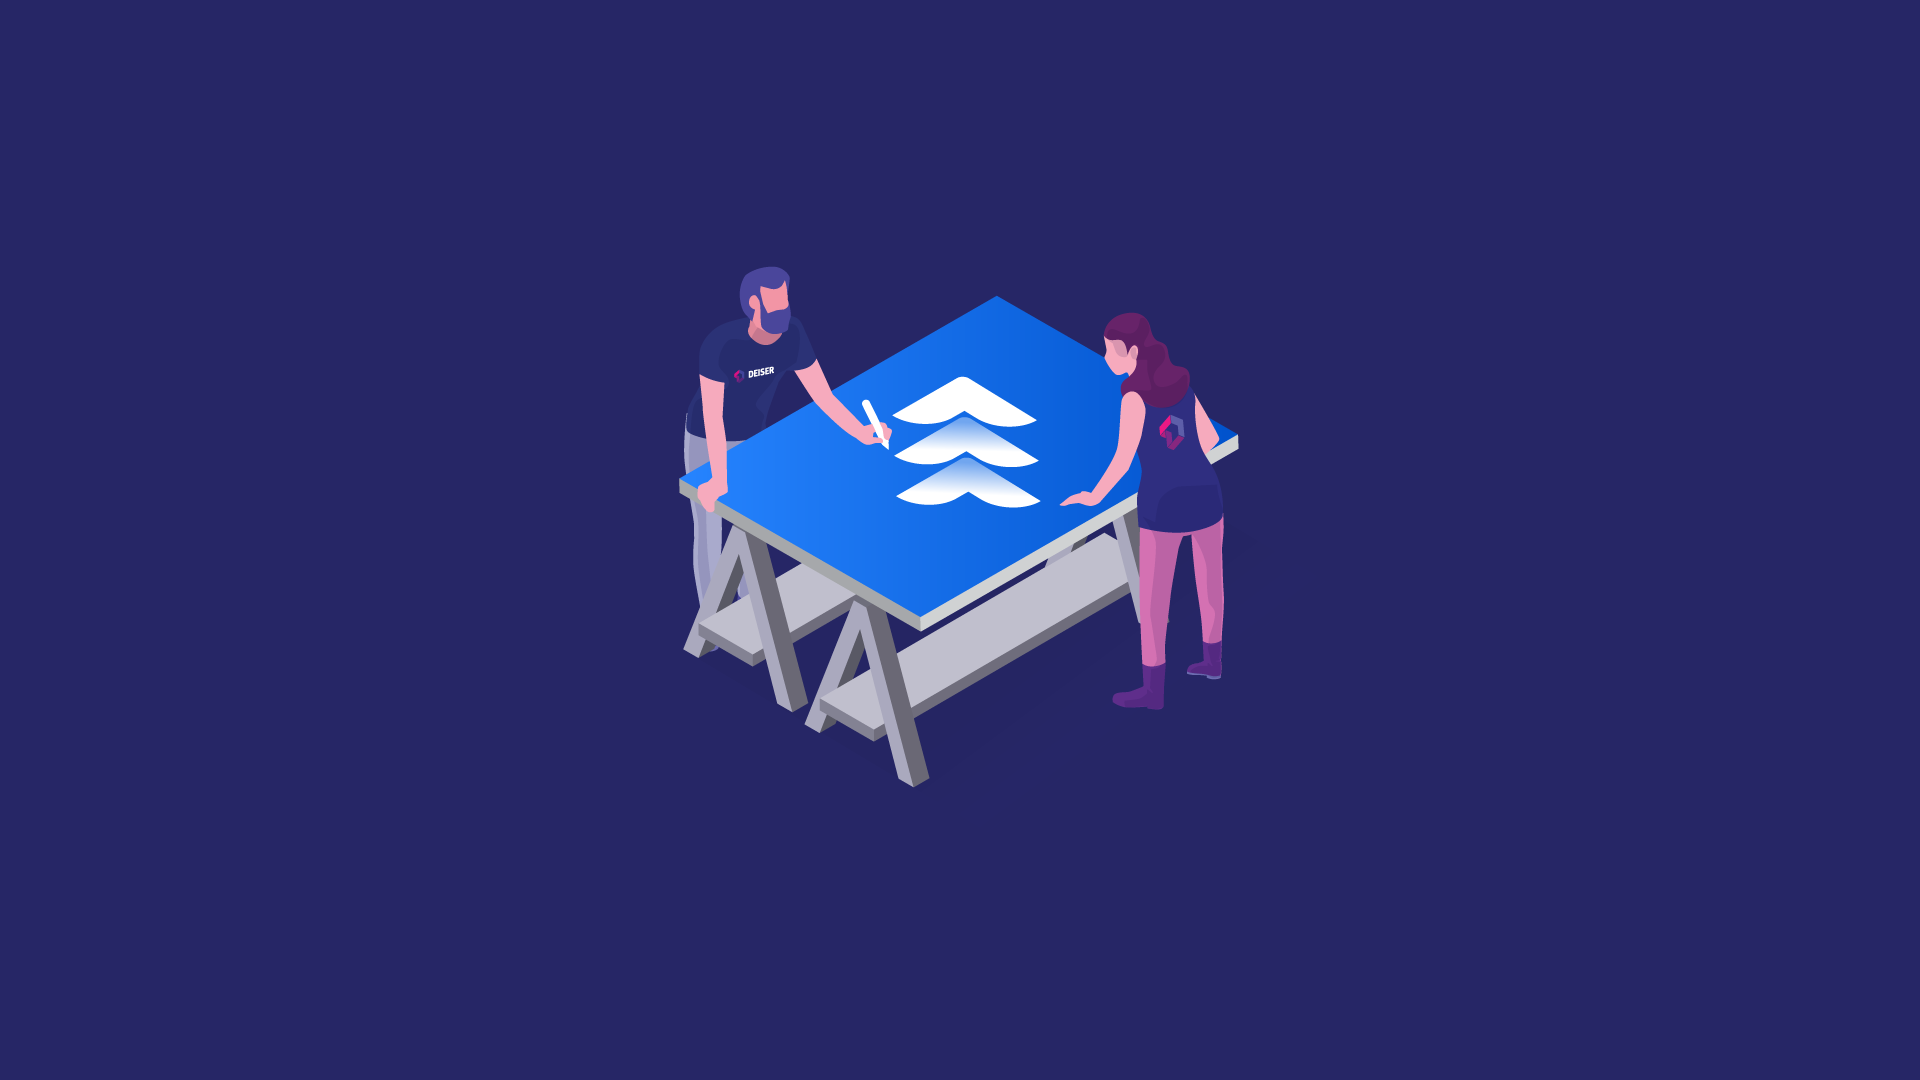 Jira Rest API: pros & cons